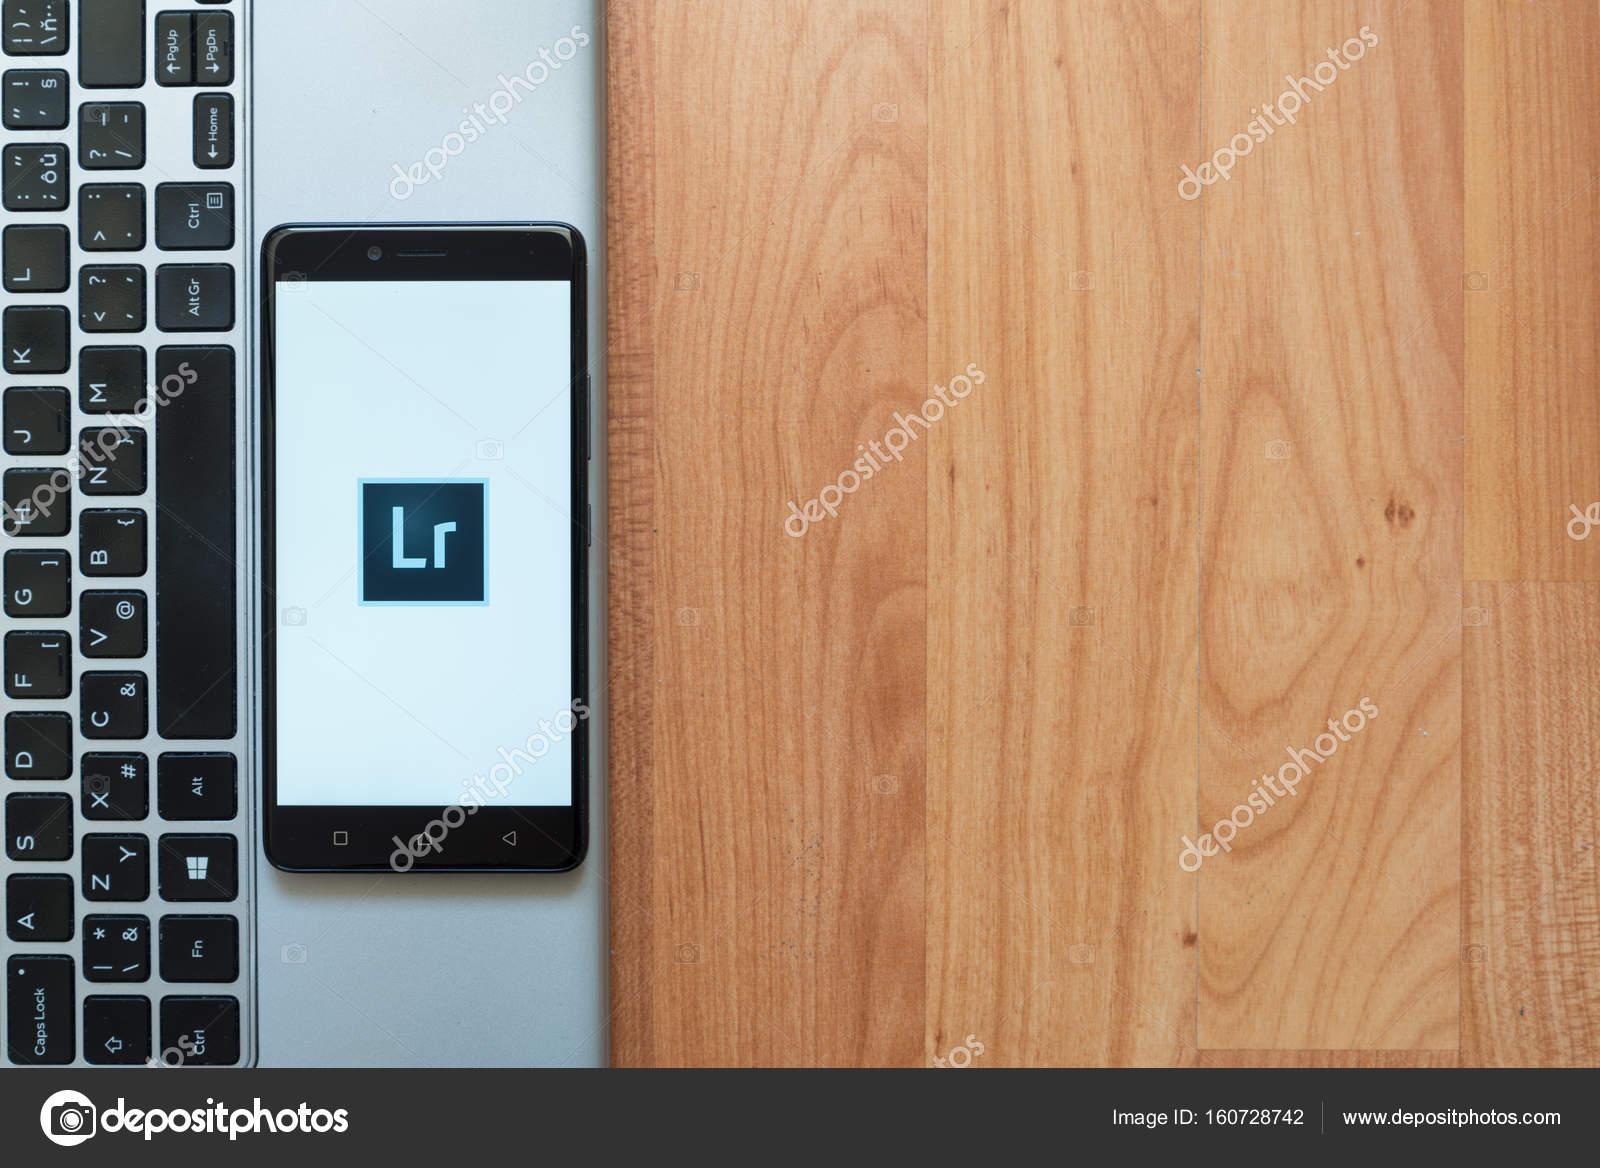 Adobe photoshop lightroom logo on smartphone – Stock